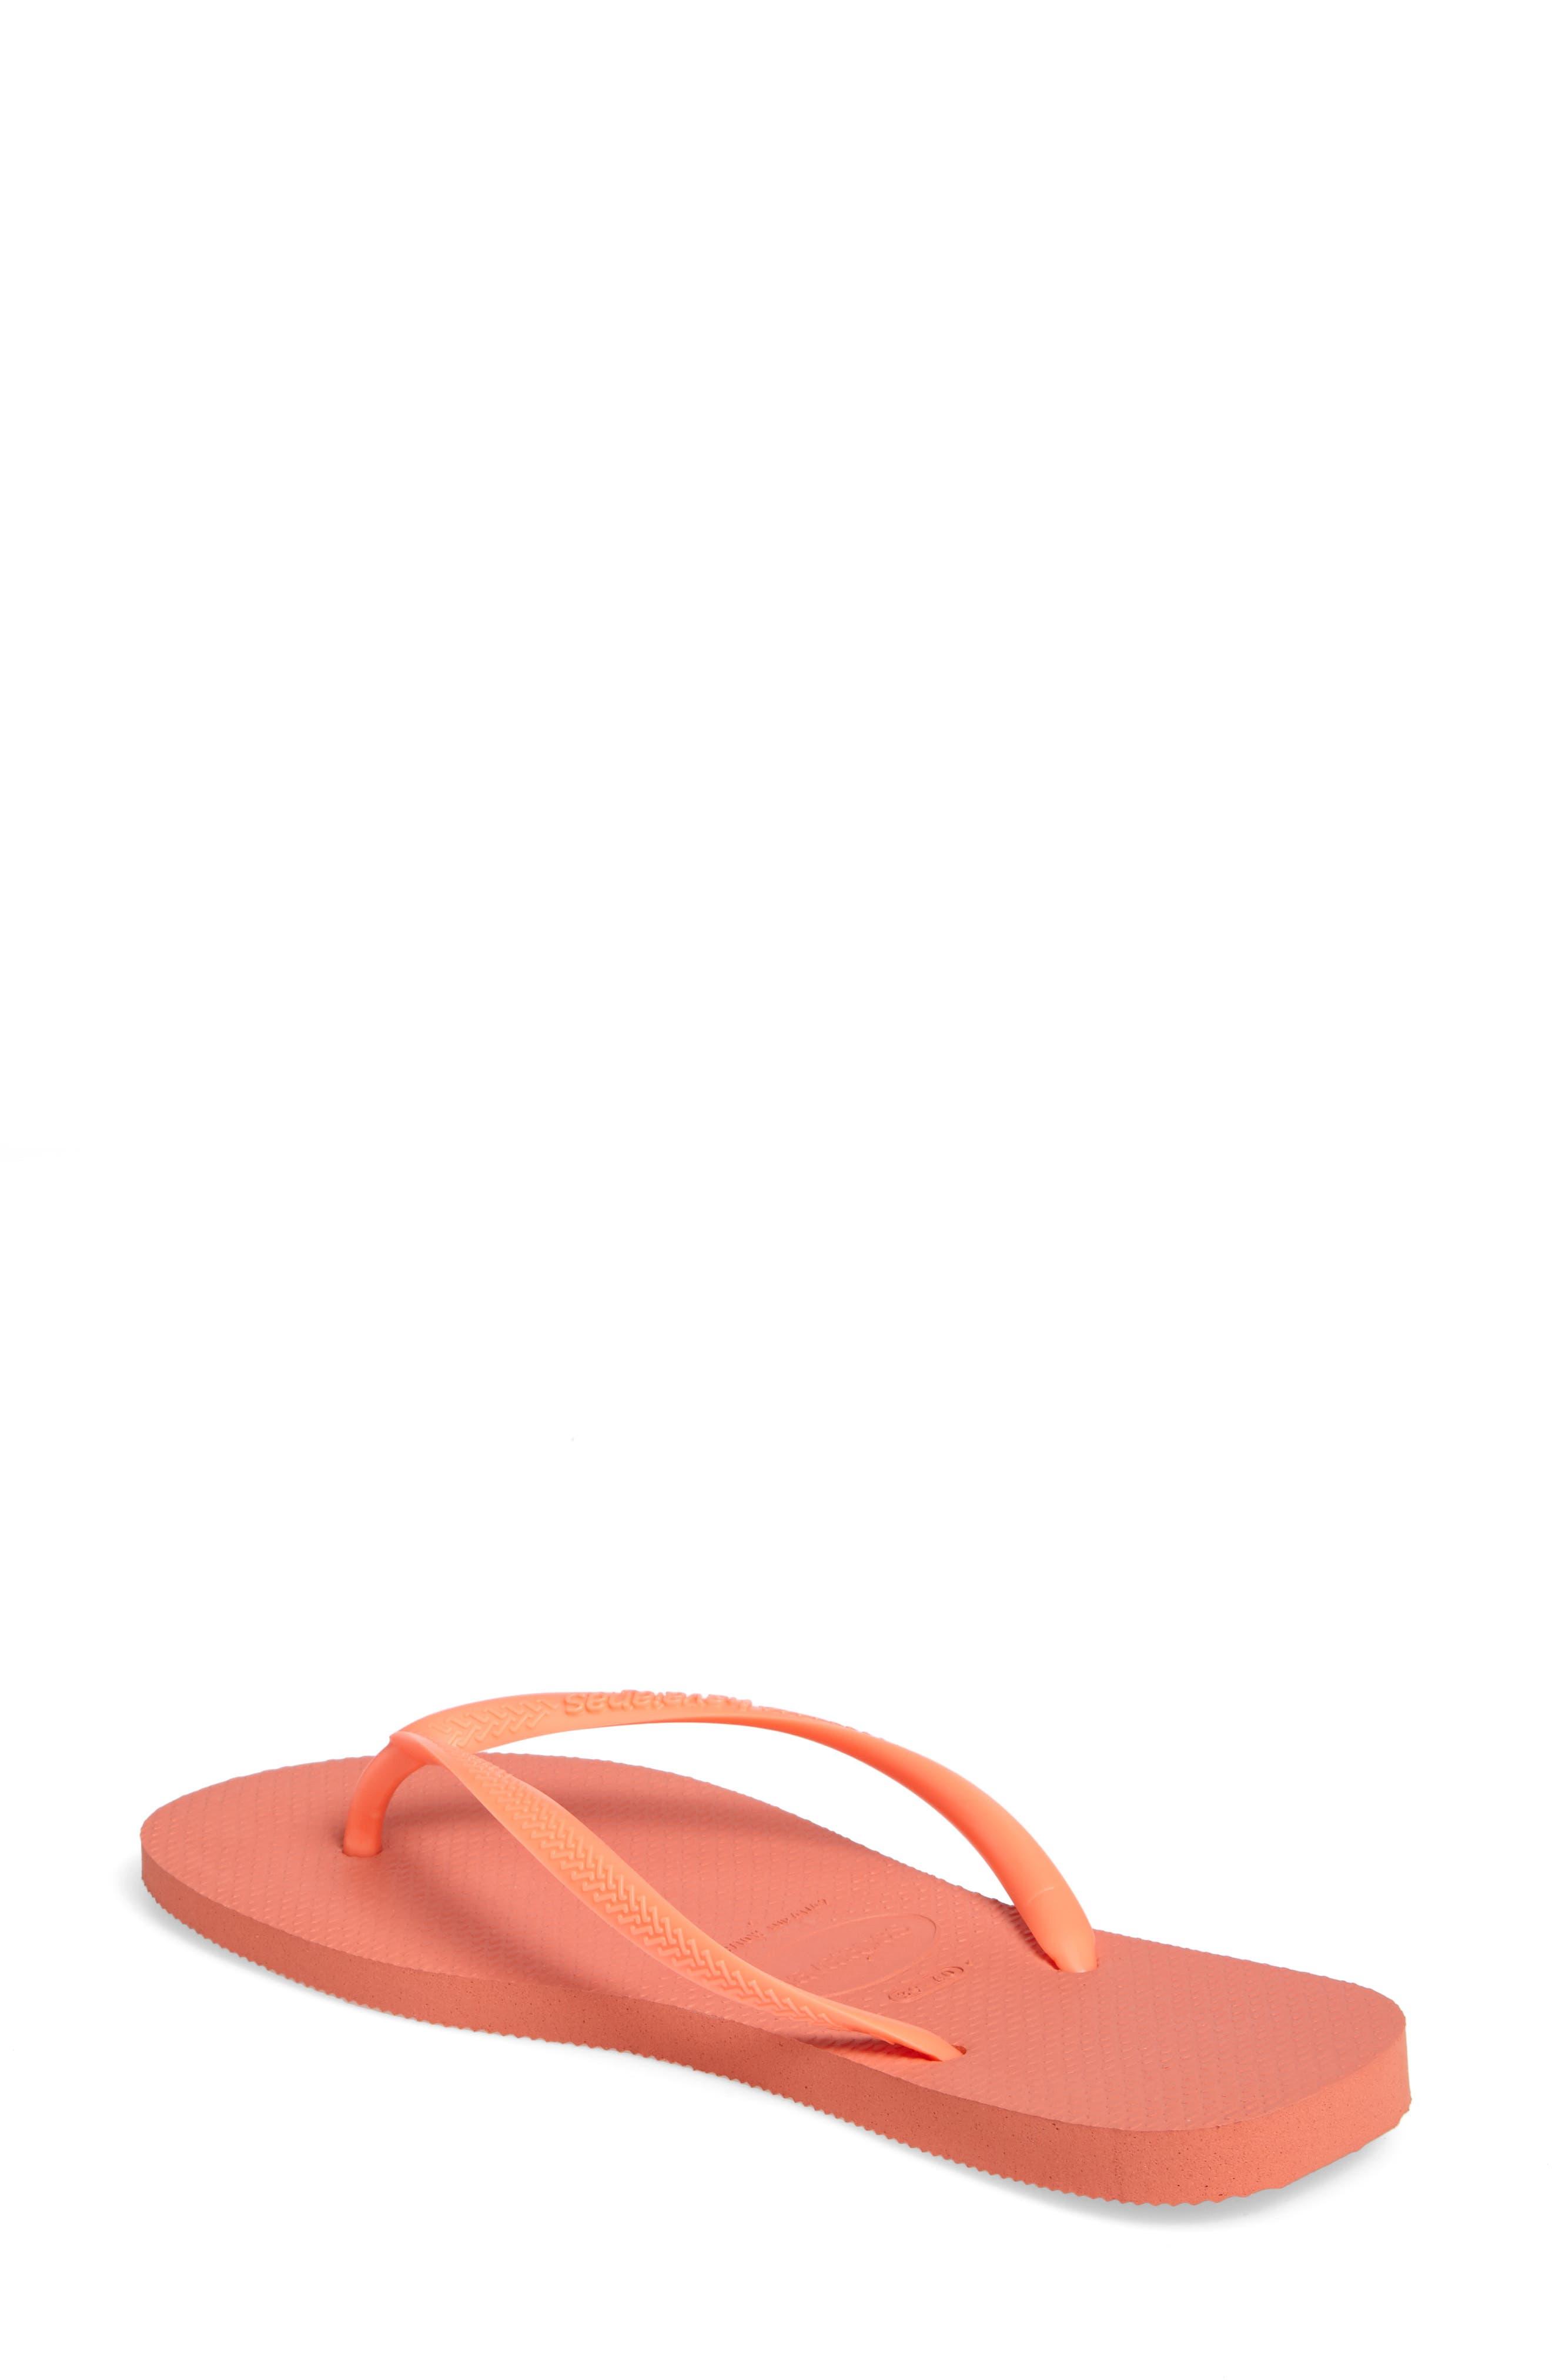 Alternate Image 2  - Havaianas 'Slim' Flip Flop (Women)